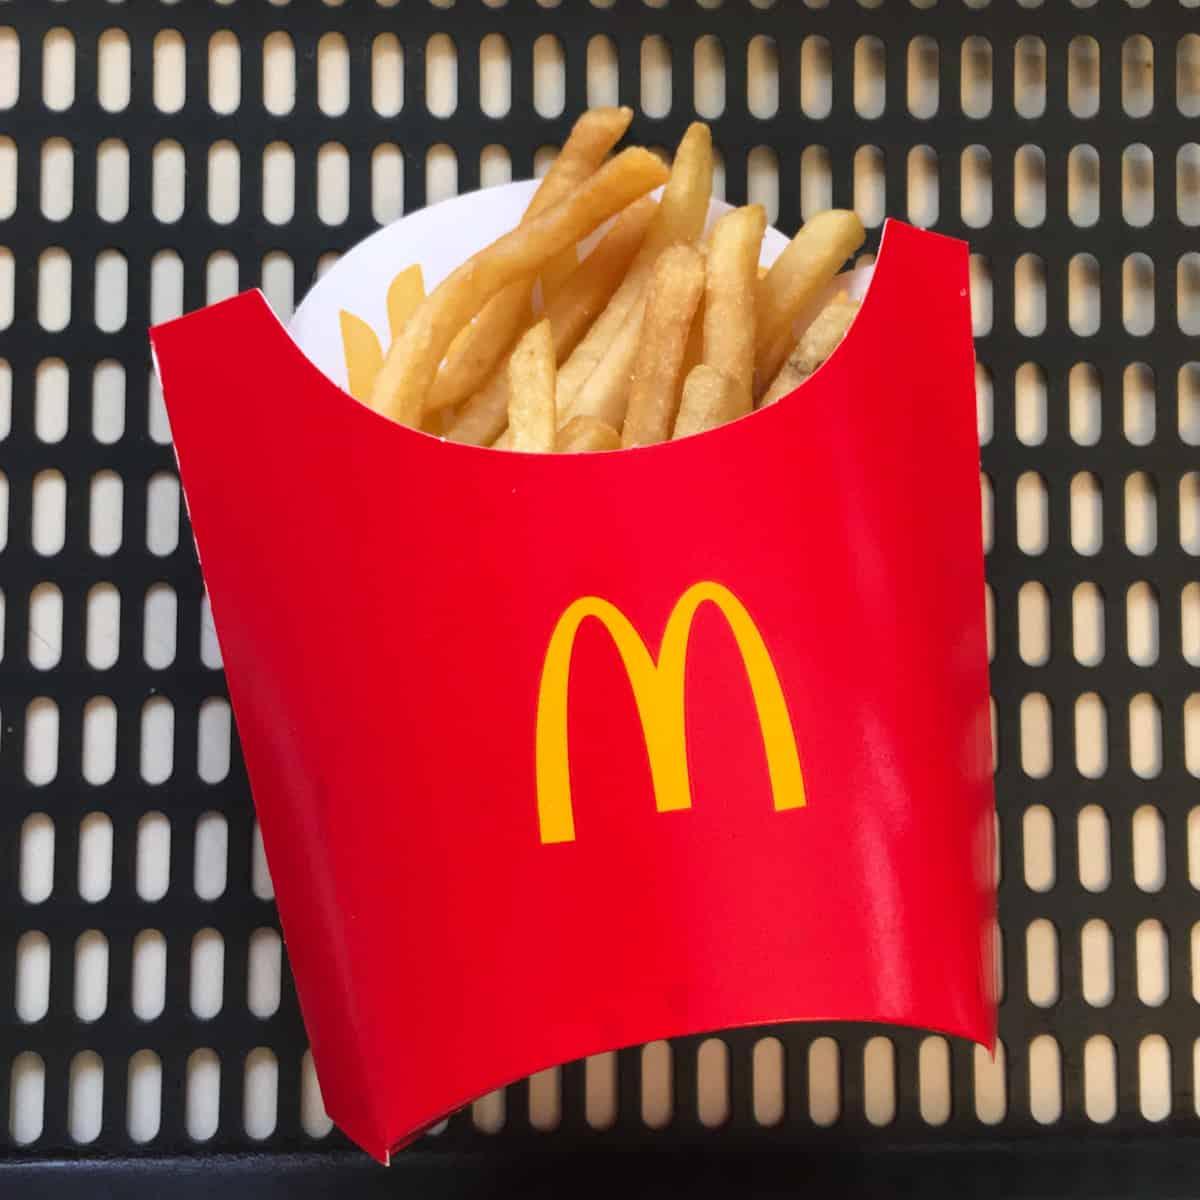 reheat mcdonalds french fries air fryer